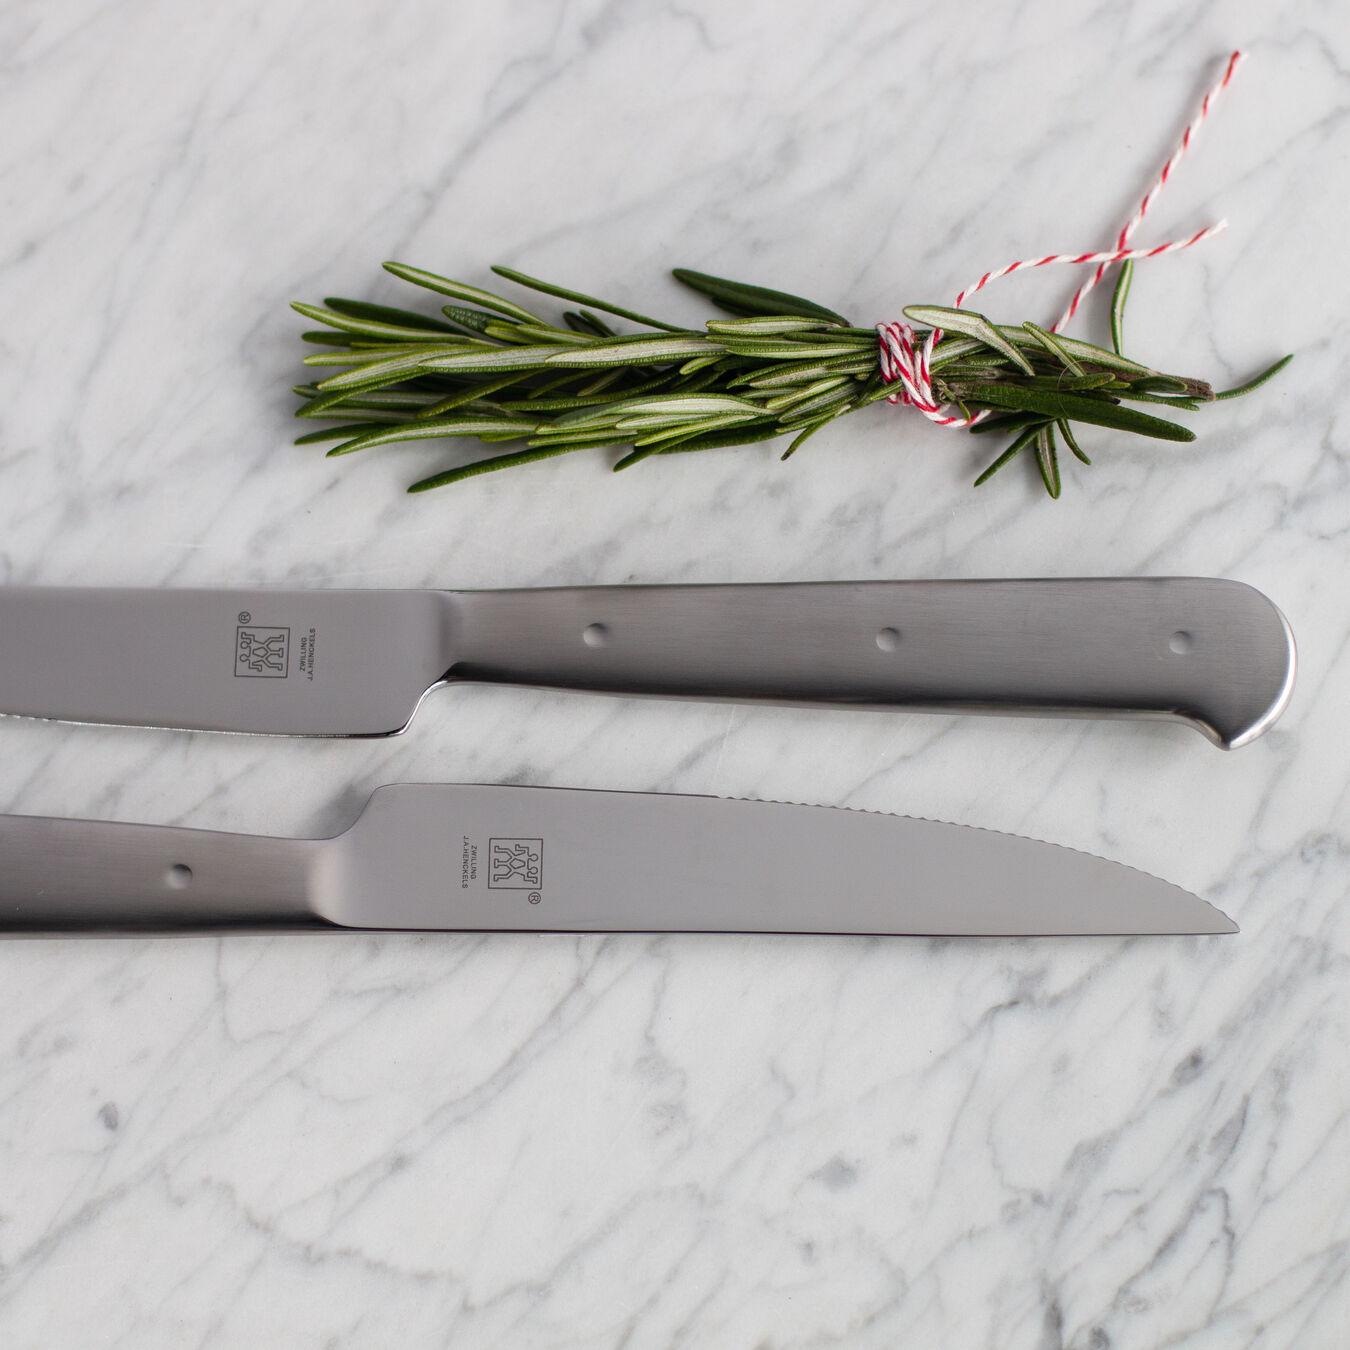 8-pc, stainless steel Porterhouse Steak Knife Set in Black Presentation Box,,large 8